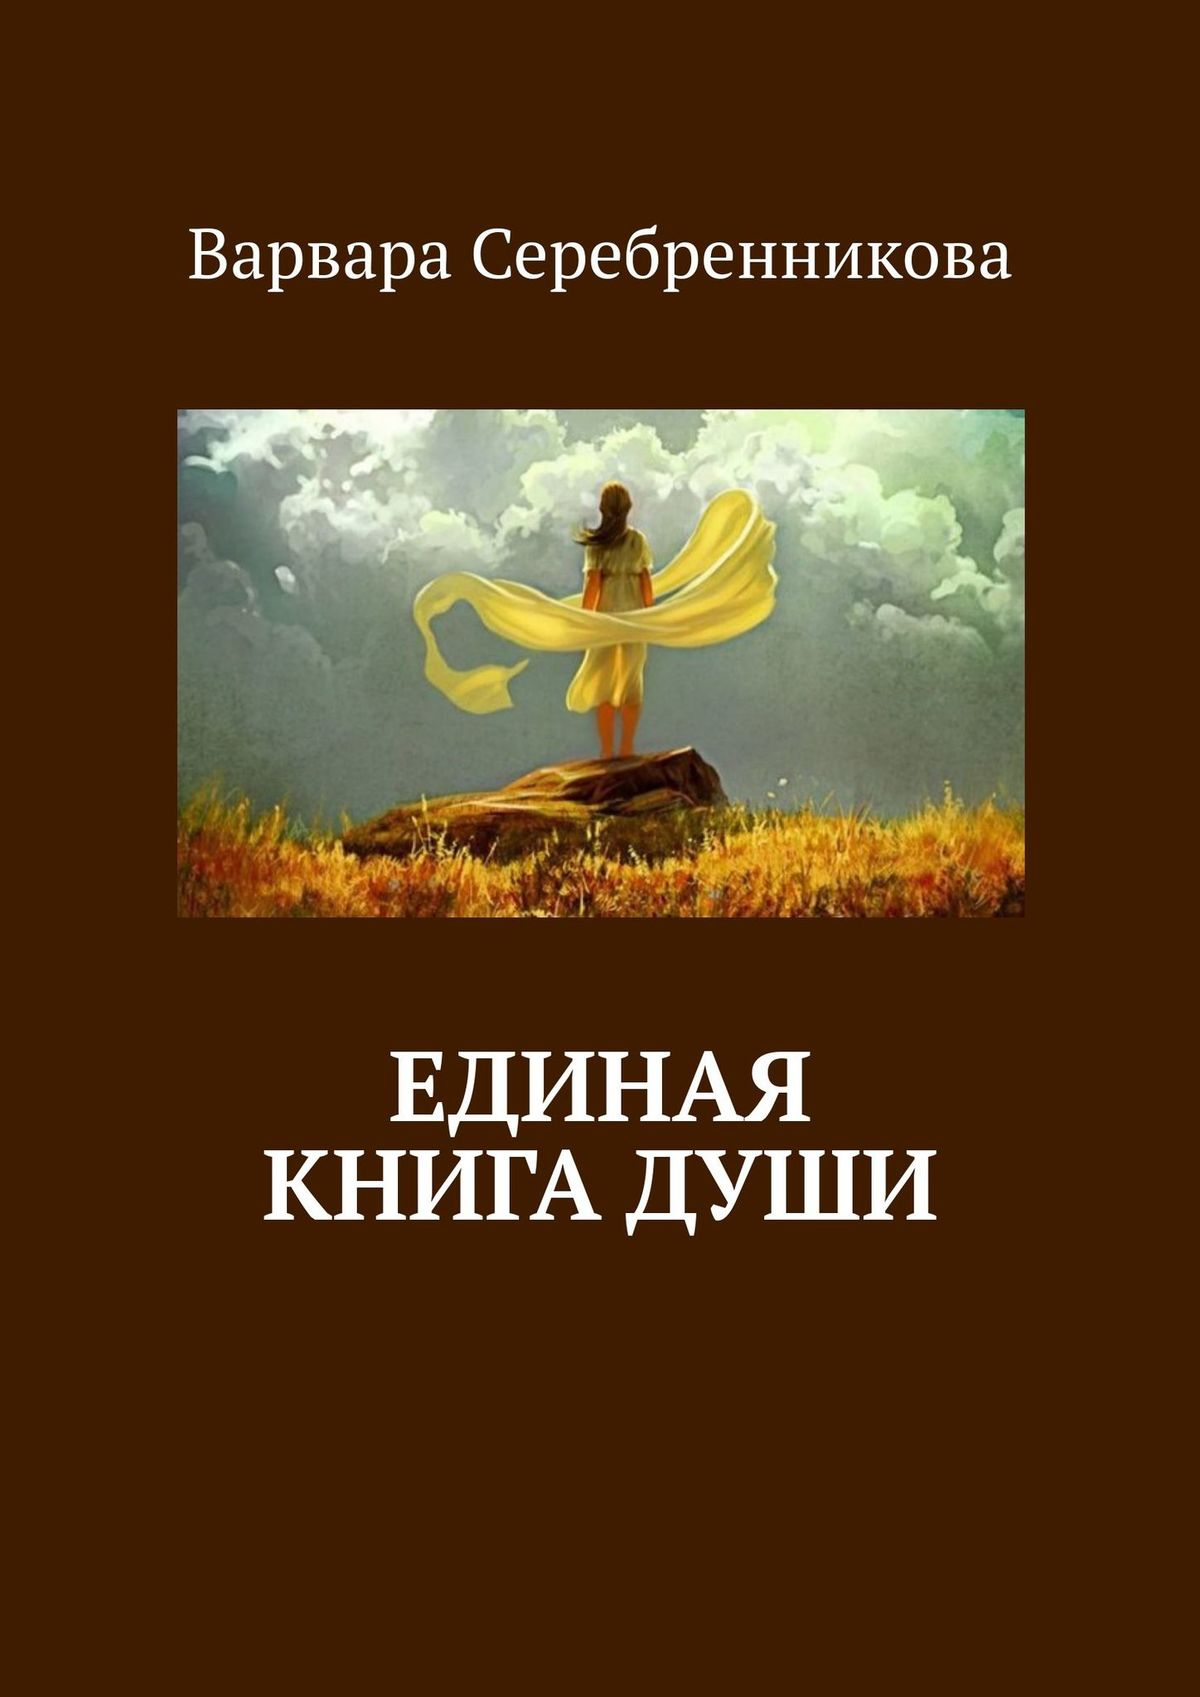 Единая книга души